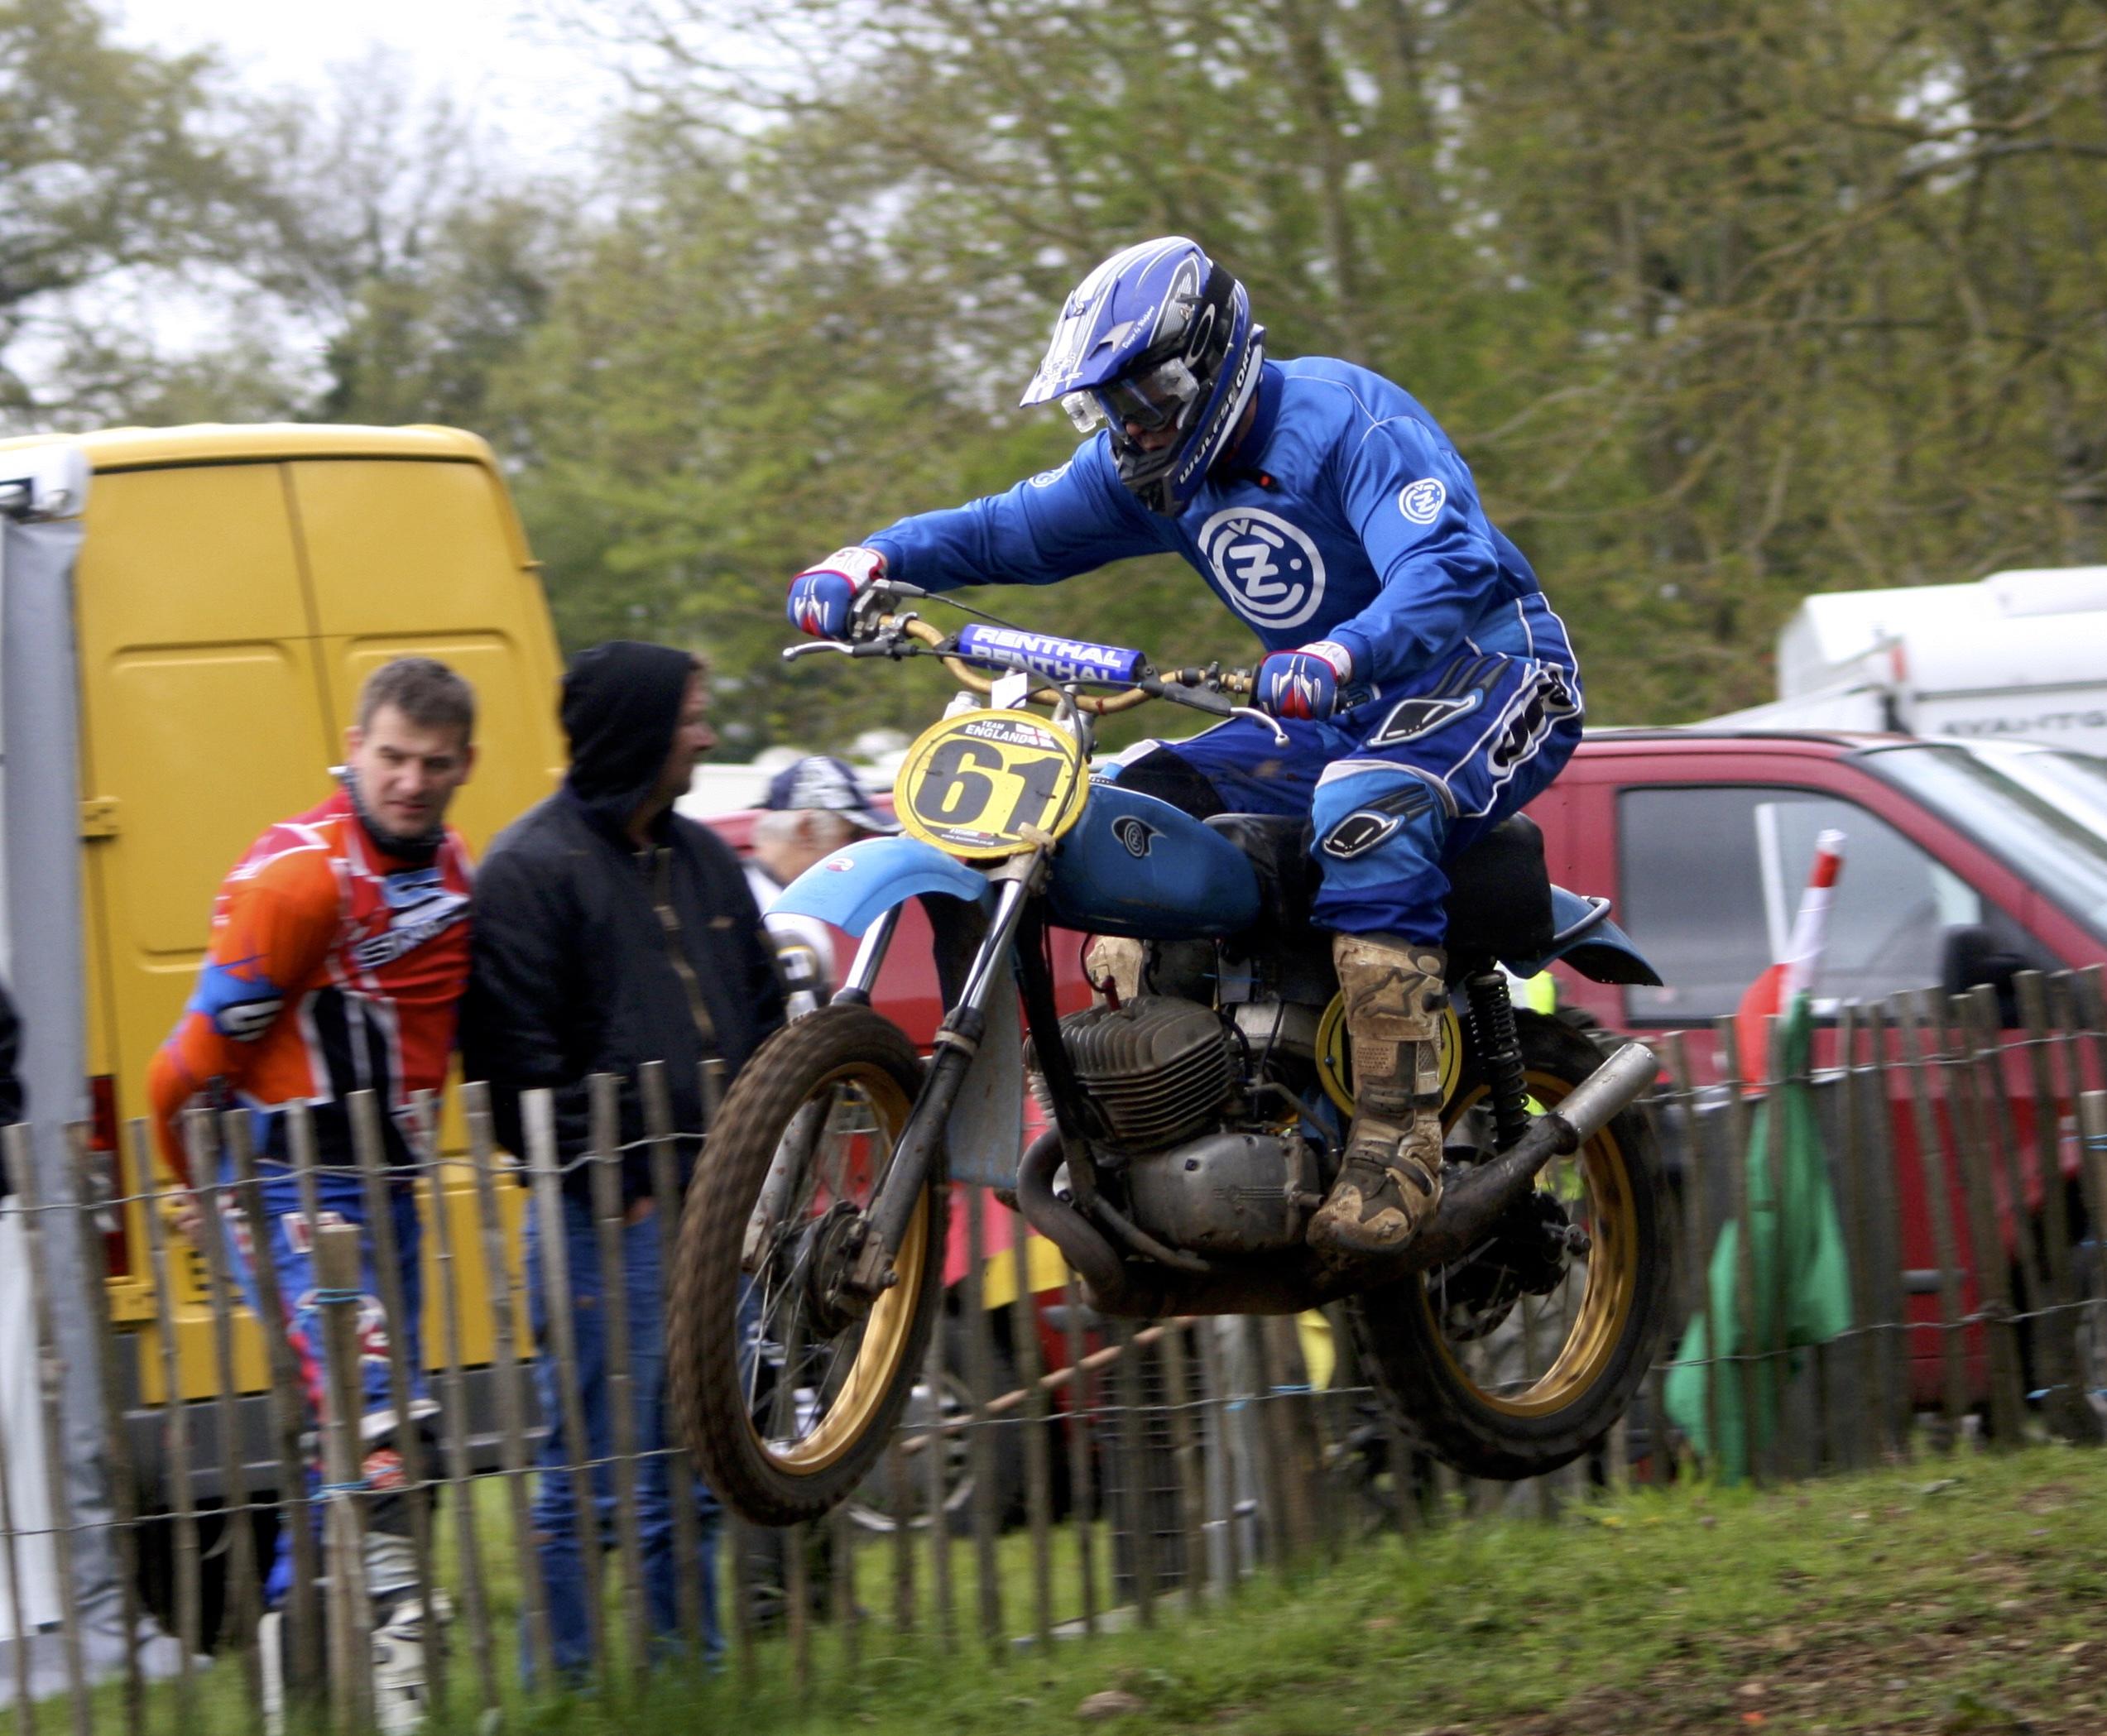 Starting Motocross Need A Motocross Club Rupert Copping